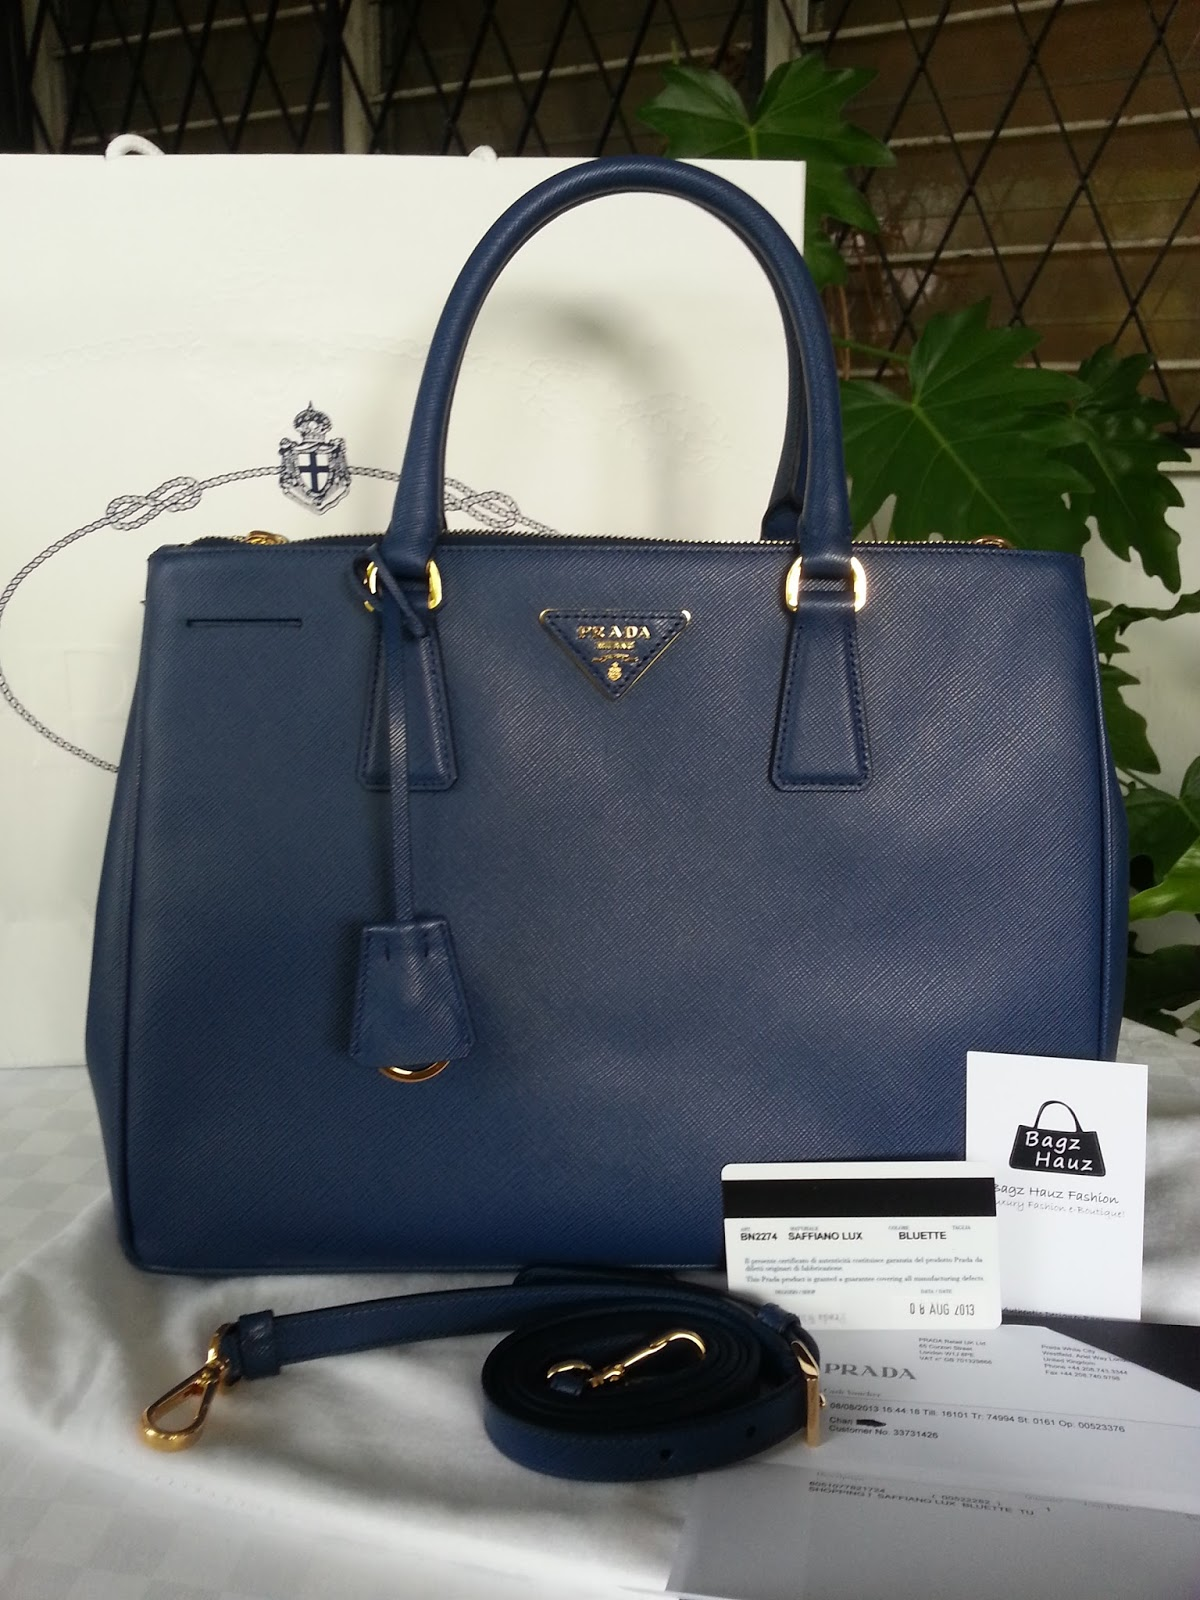 004eac9e5f8b Bagz Hauz Fashion    SOLD   ~ PRADA BN2274 Saffiano Lux Leather .